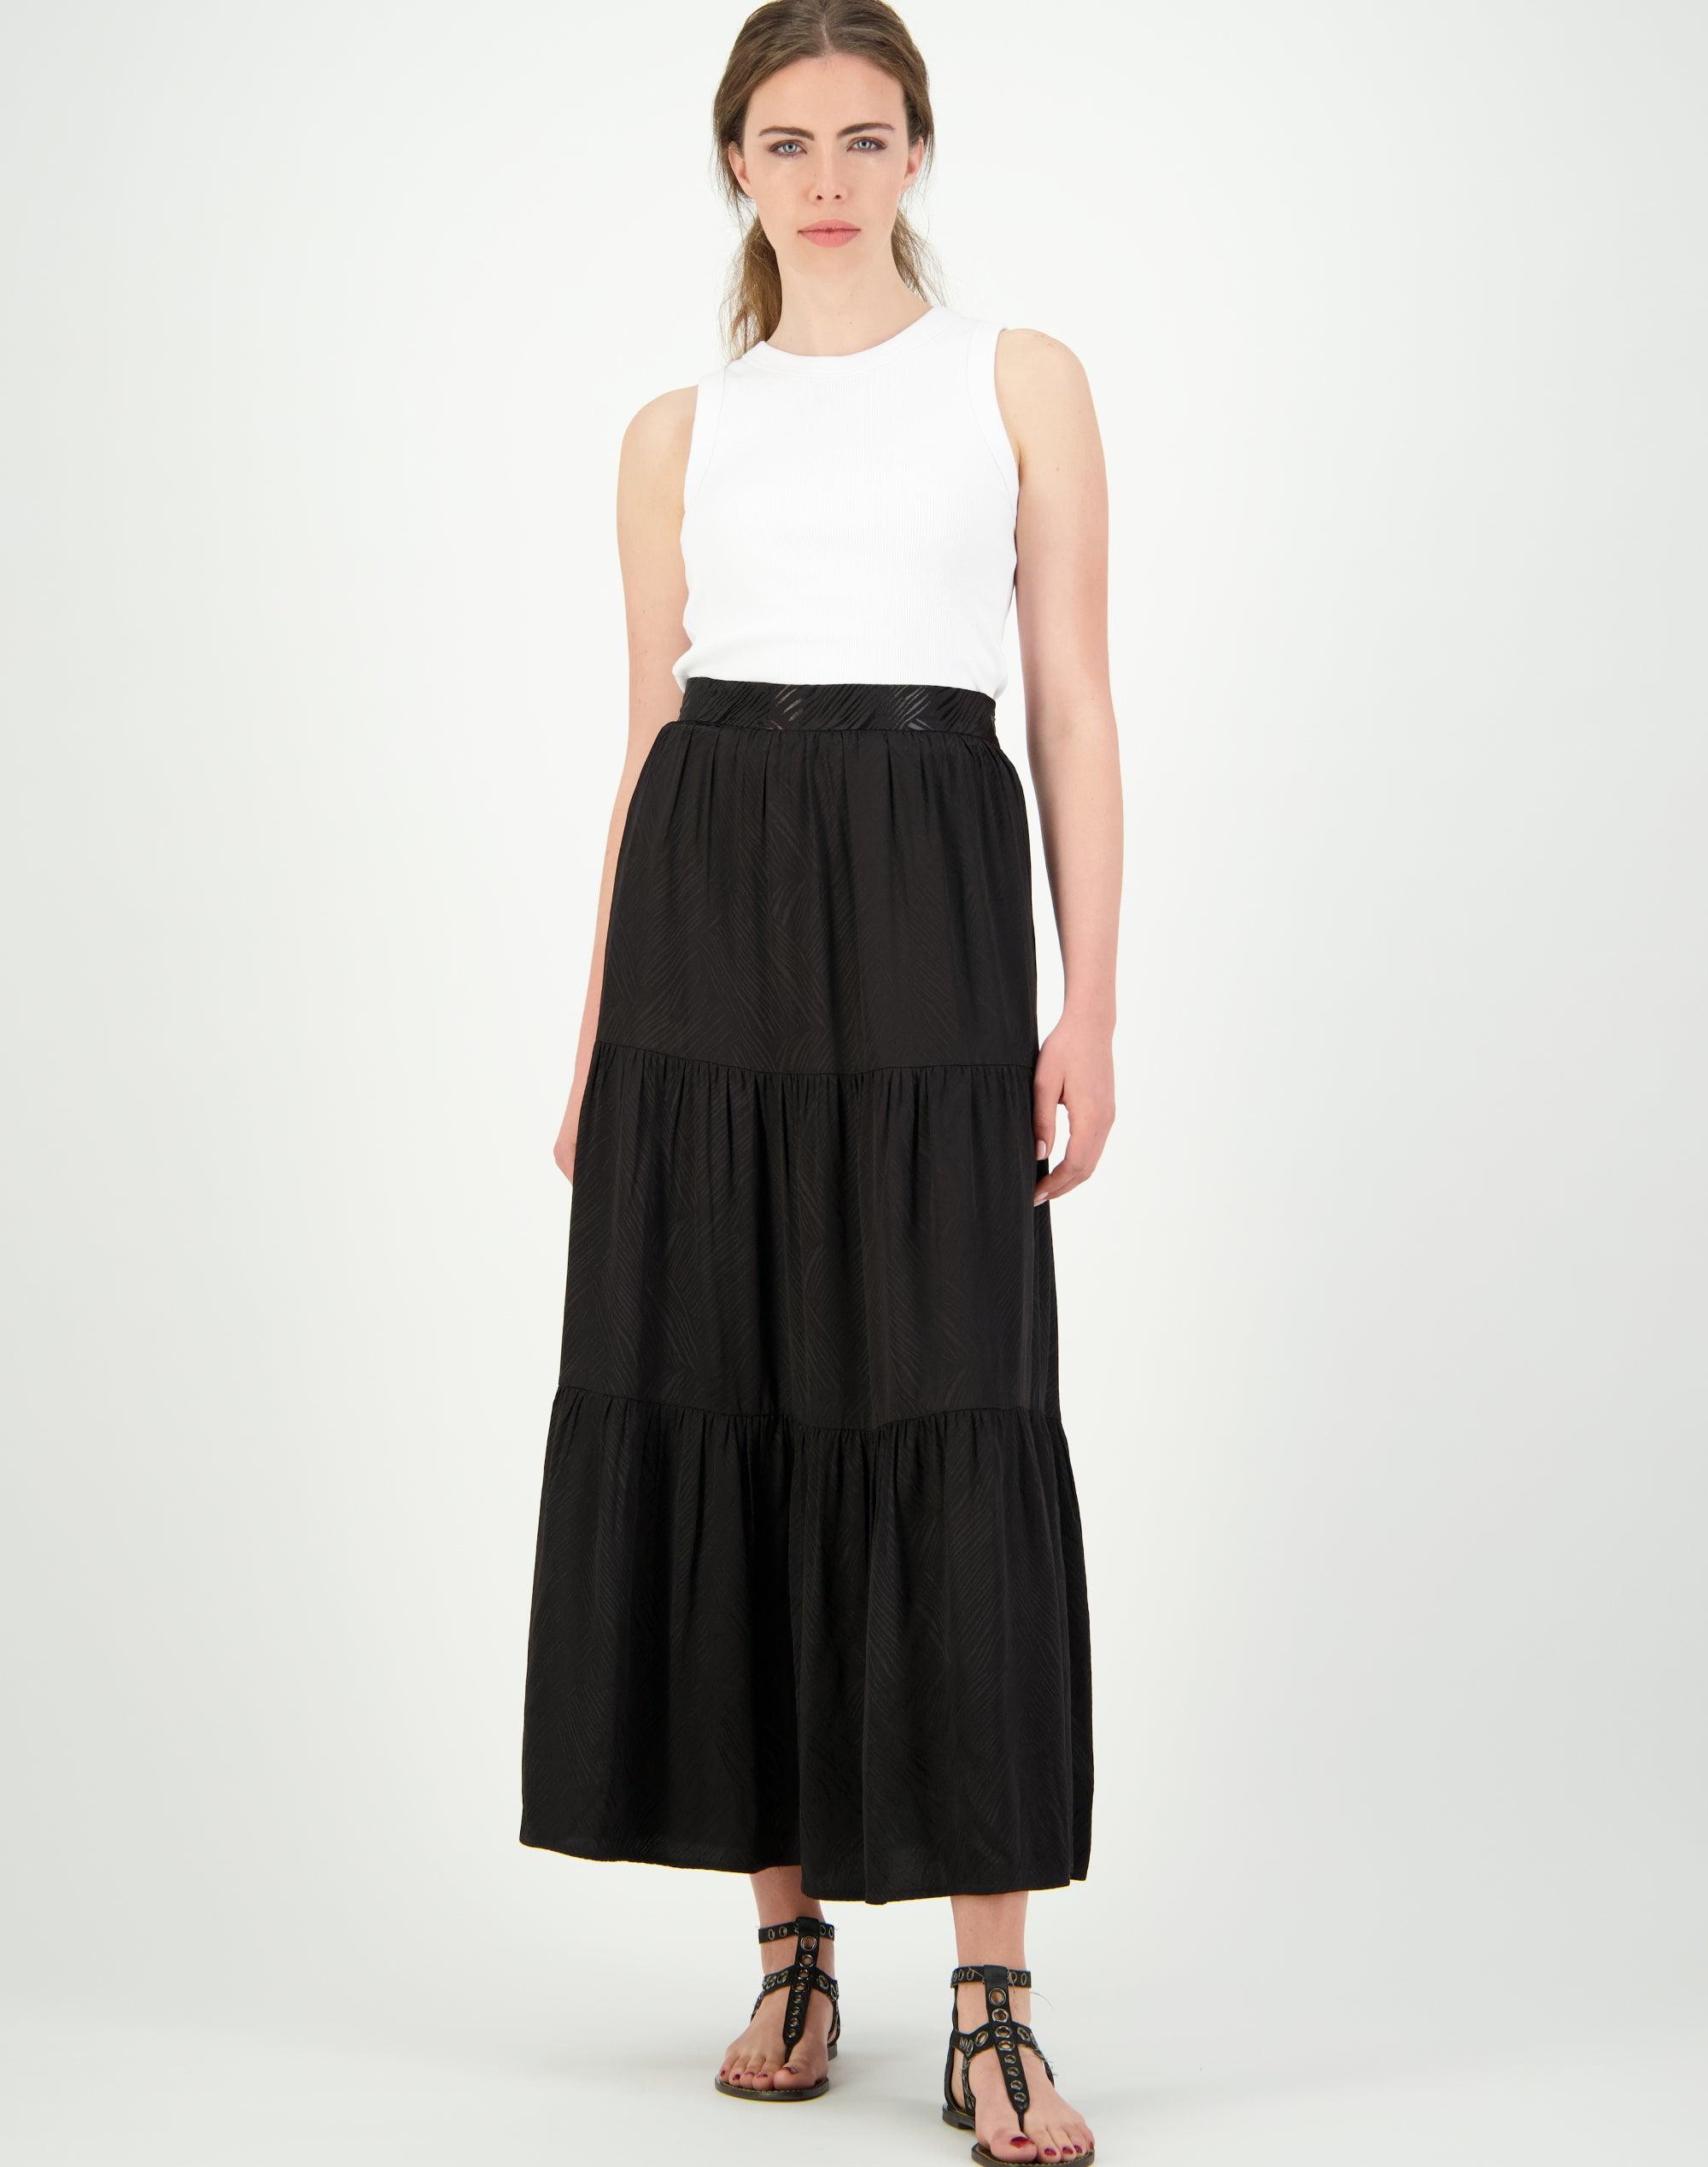 Jacquard Tiered Skirt